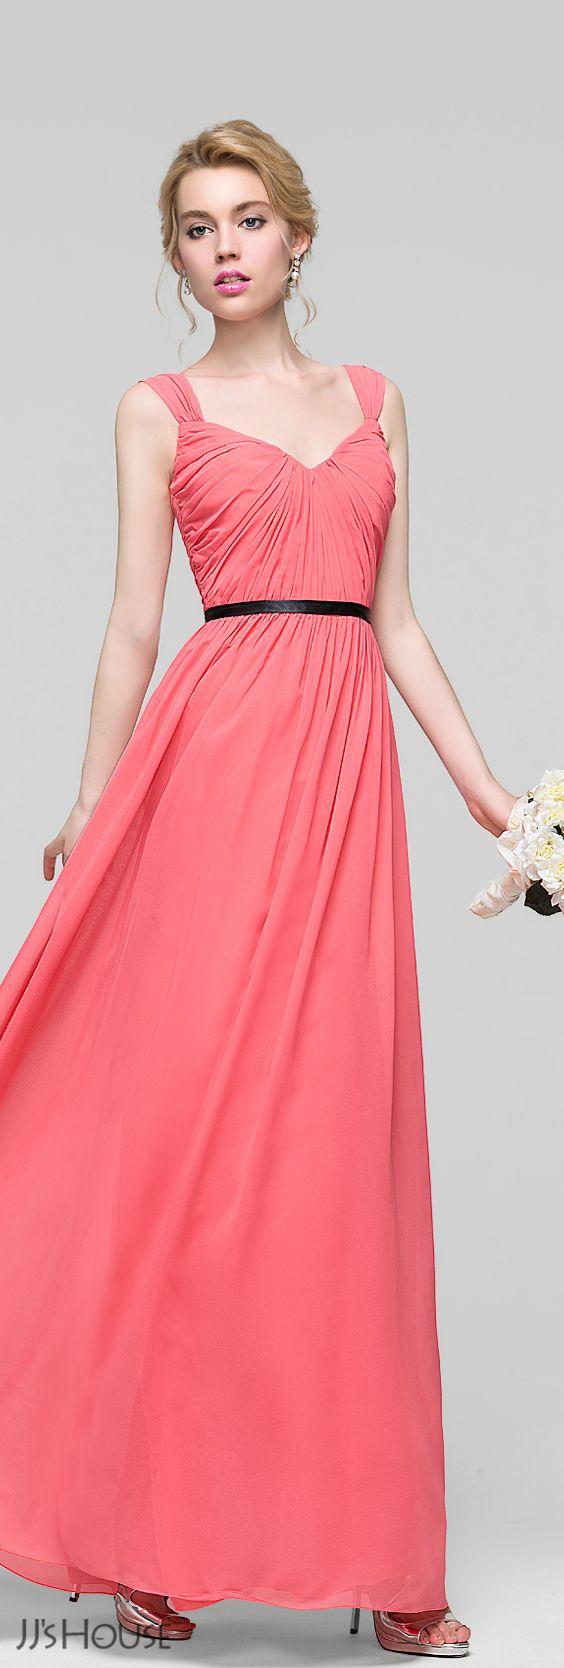 A-Line/Princess Floor-Length Chiffon Bridesmaid Dress With Ruffle ...